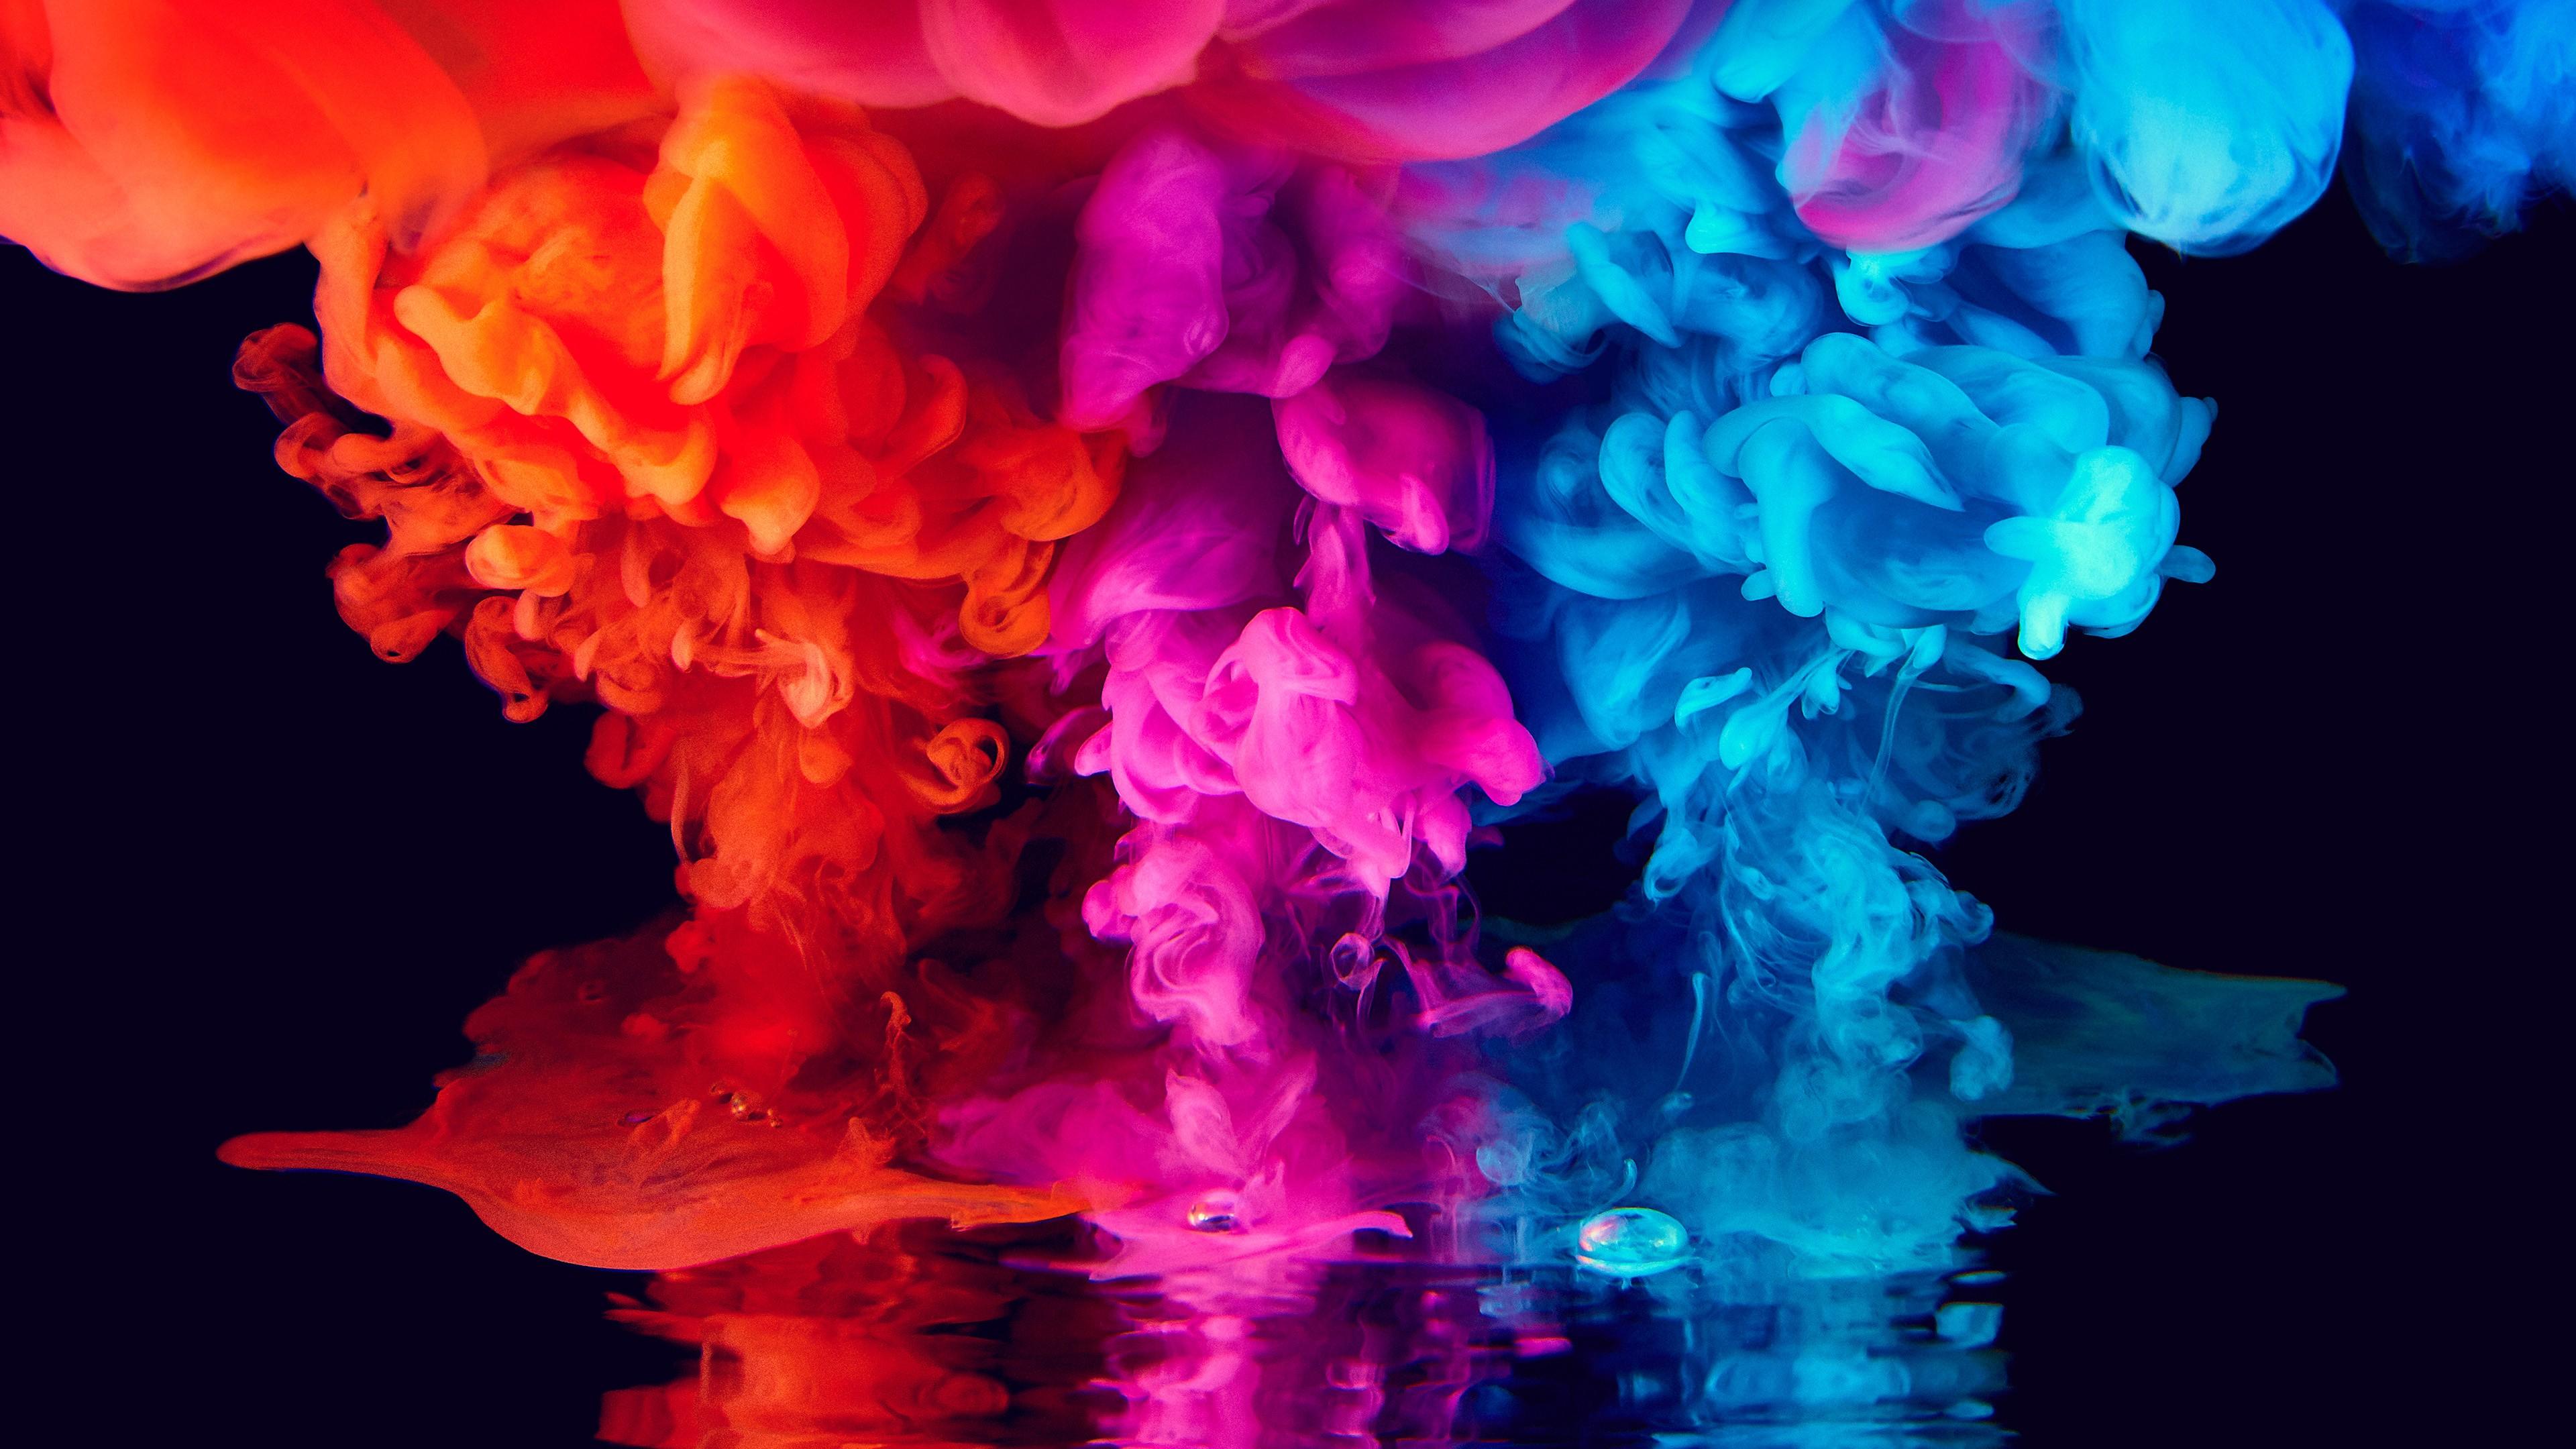 Colorful Smoke 4k Wallpapers - Humo De Colores 4k , HD Wallpaper & Backgrounds